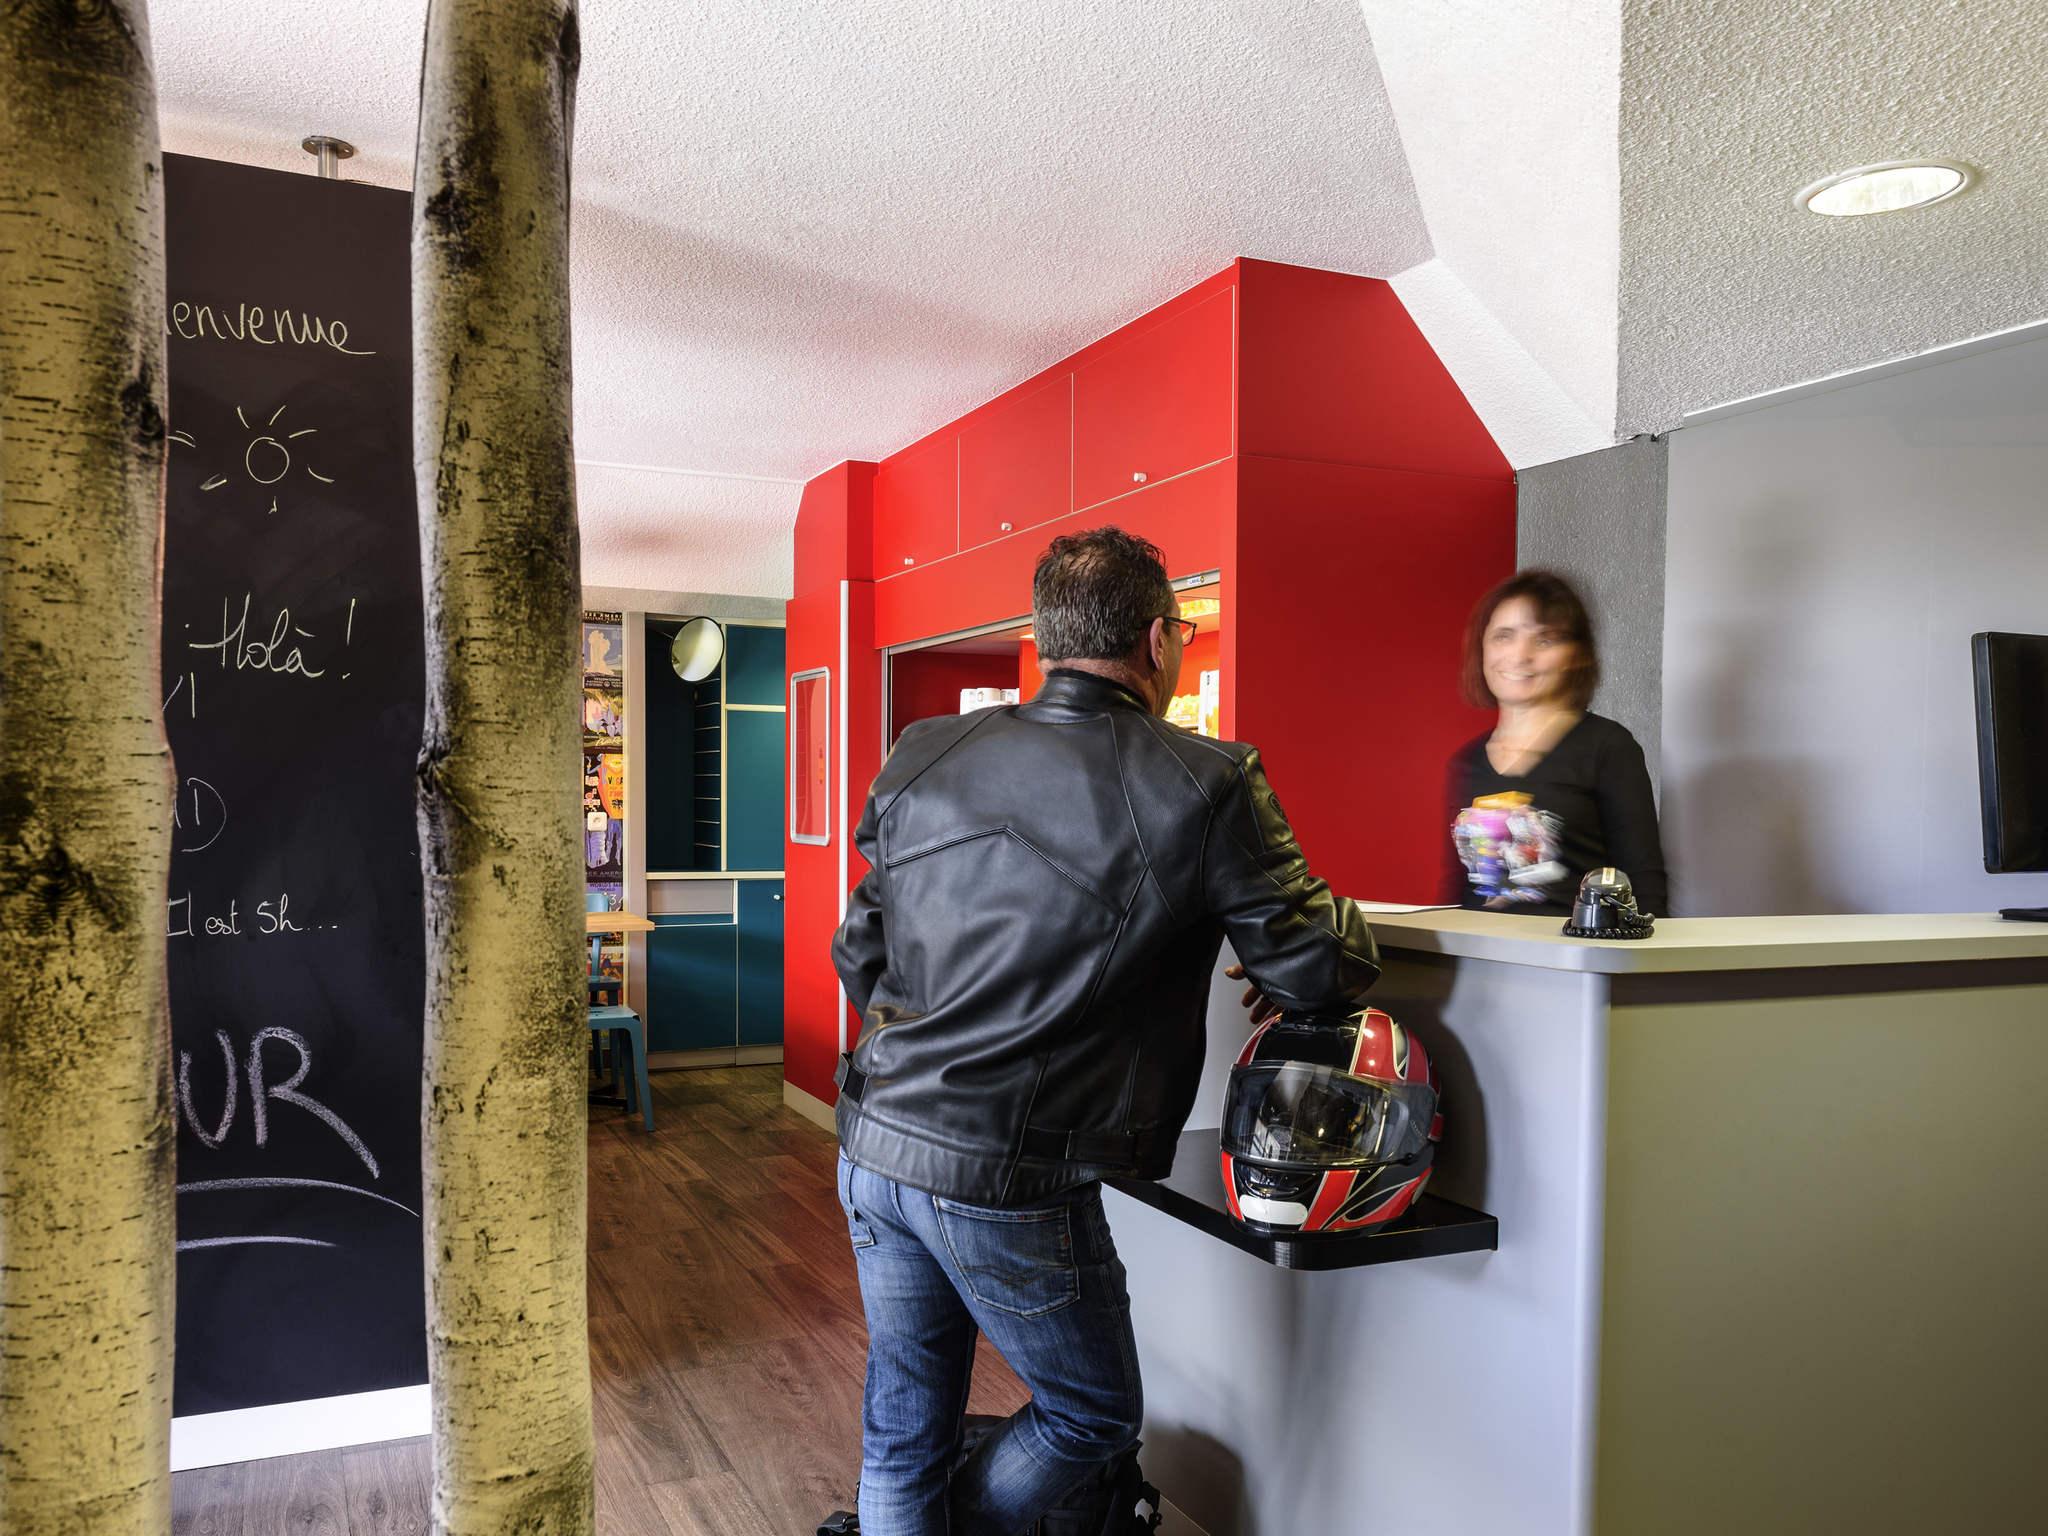 Hotel - hotelF1 Calais Coquelles